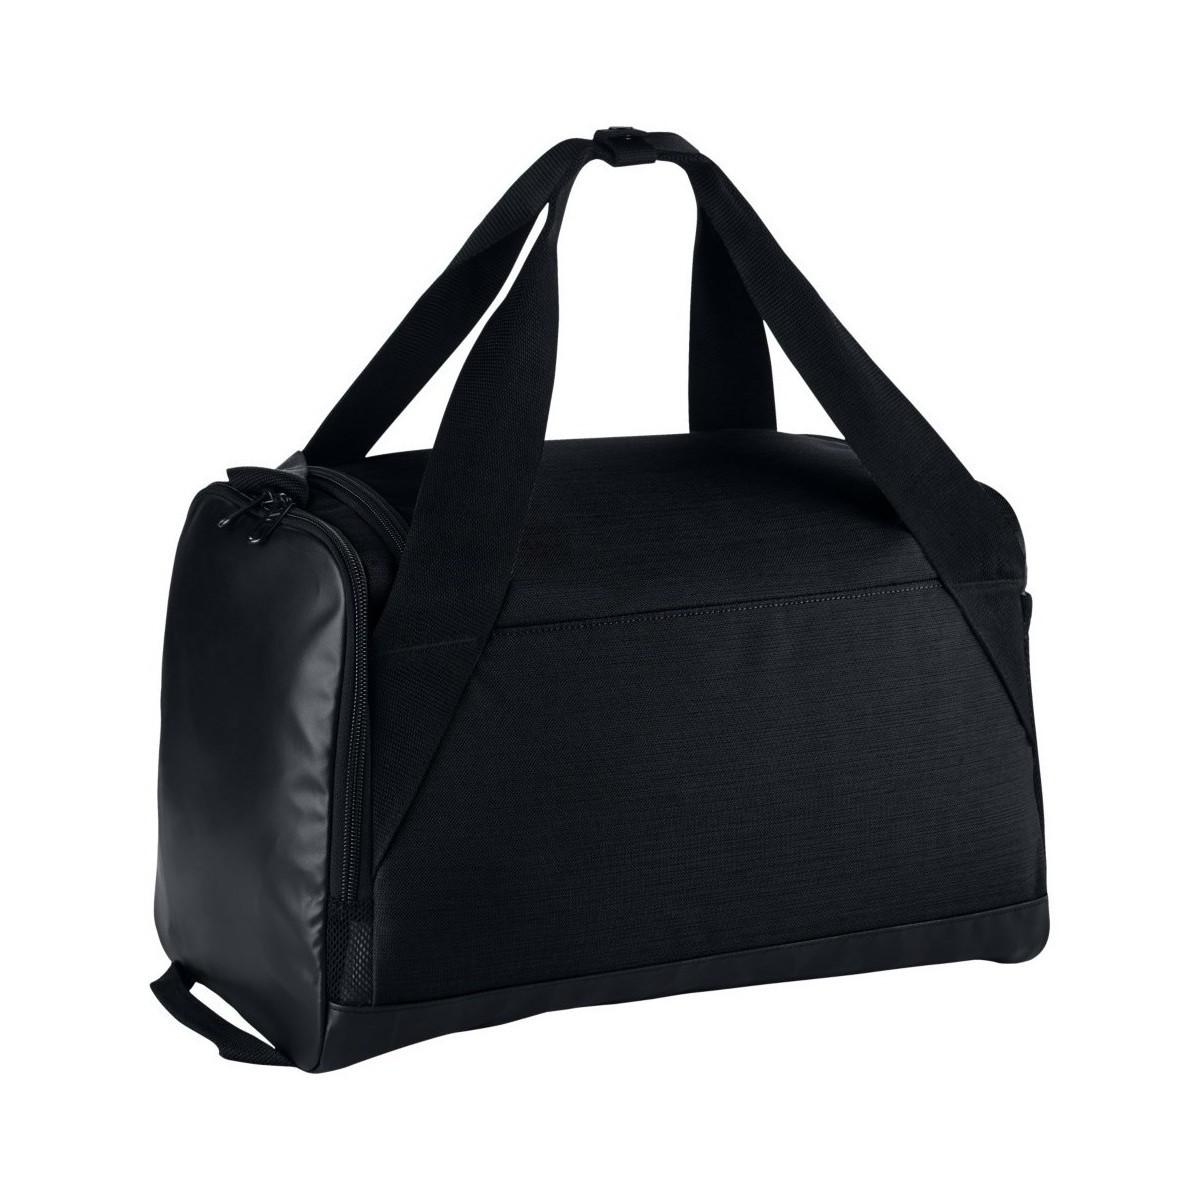 d43d005eeb Nike Brasilia Extra Small Xs Duff Men s Travel Bag In Black in Black ...